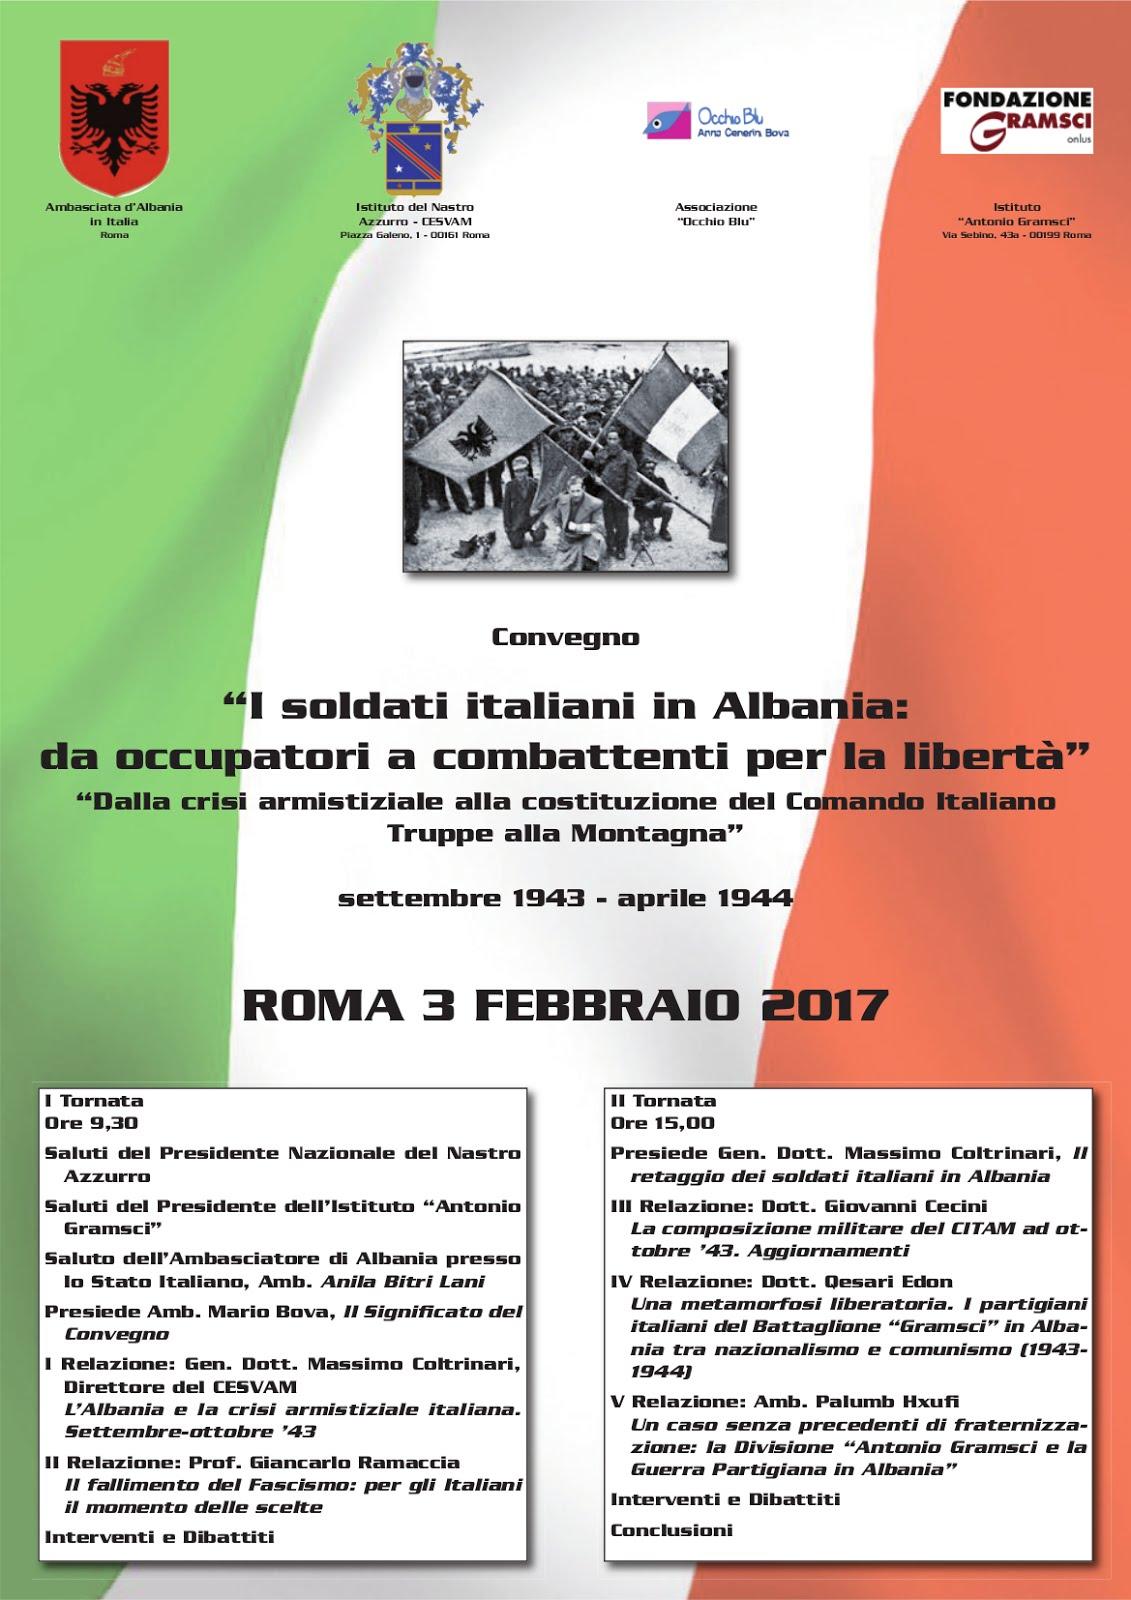 Roma. Venerdì 3 Febbraio 2017 ore 9